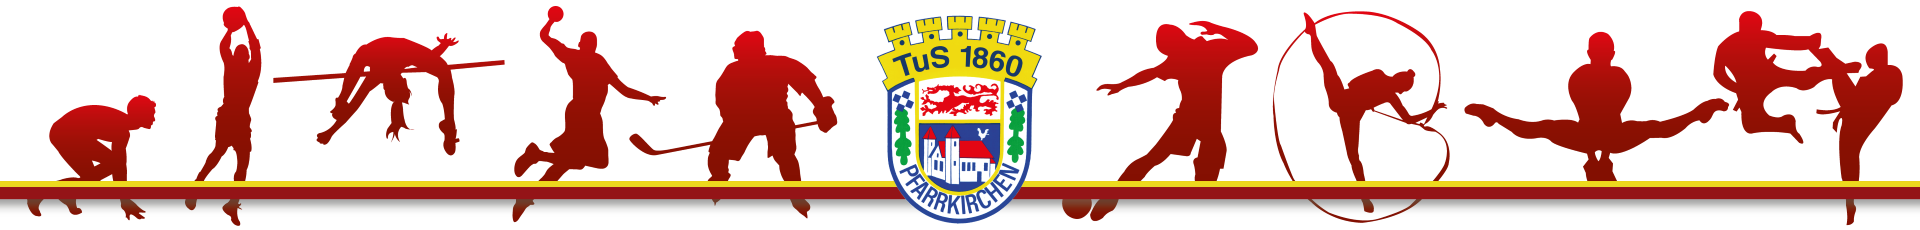 TuS Pfarrkirchen Logo